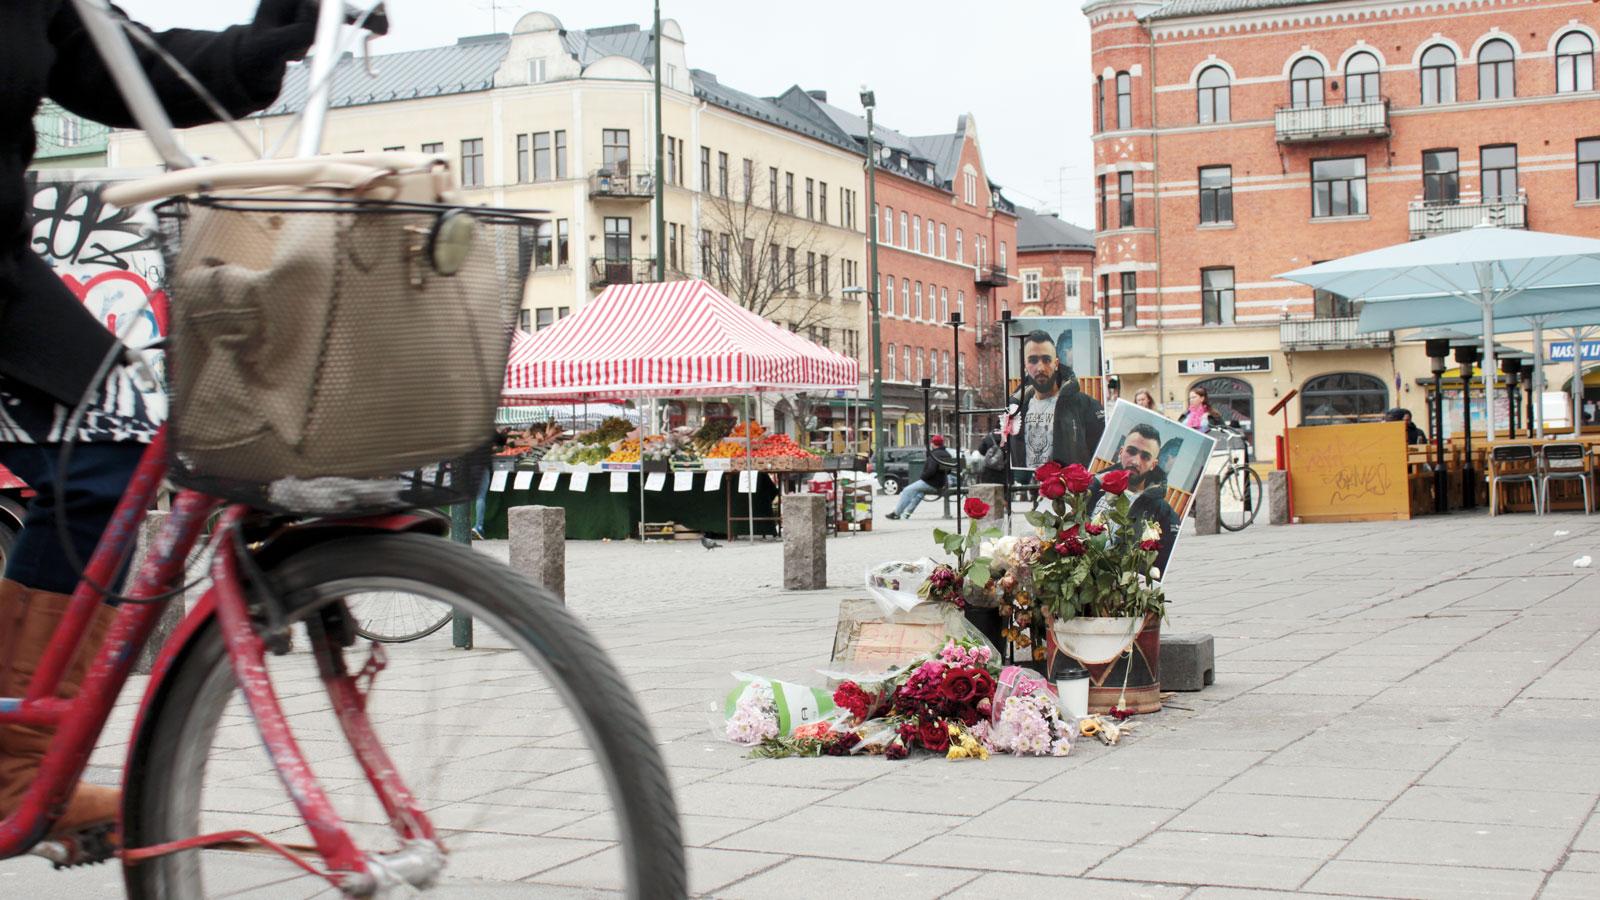 träffa privata eskorter doggy stil i Malmö